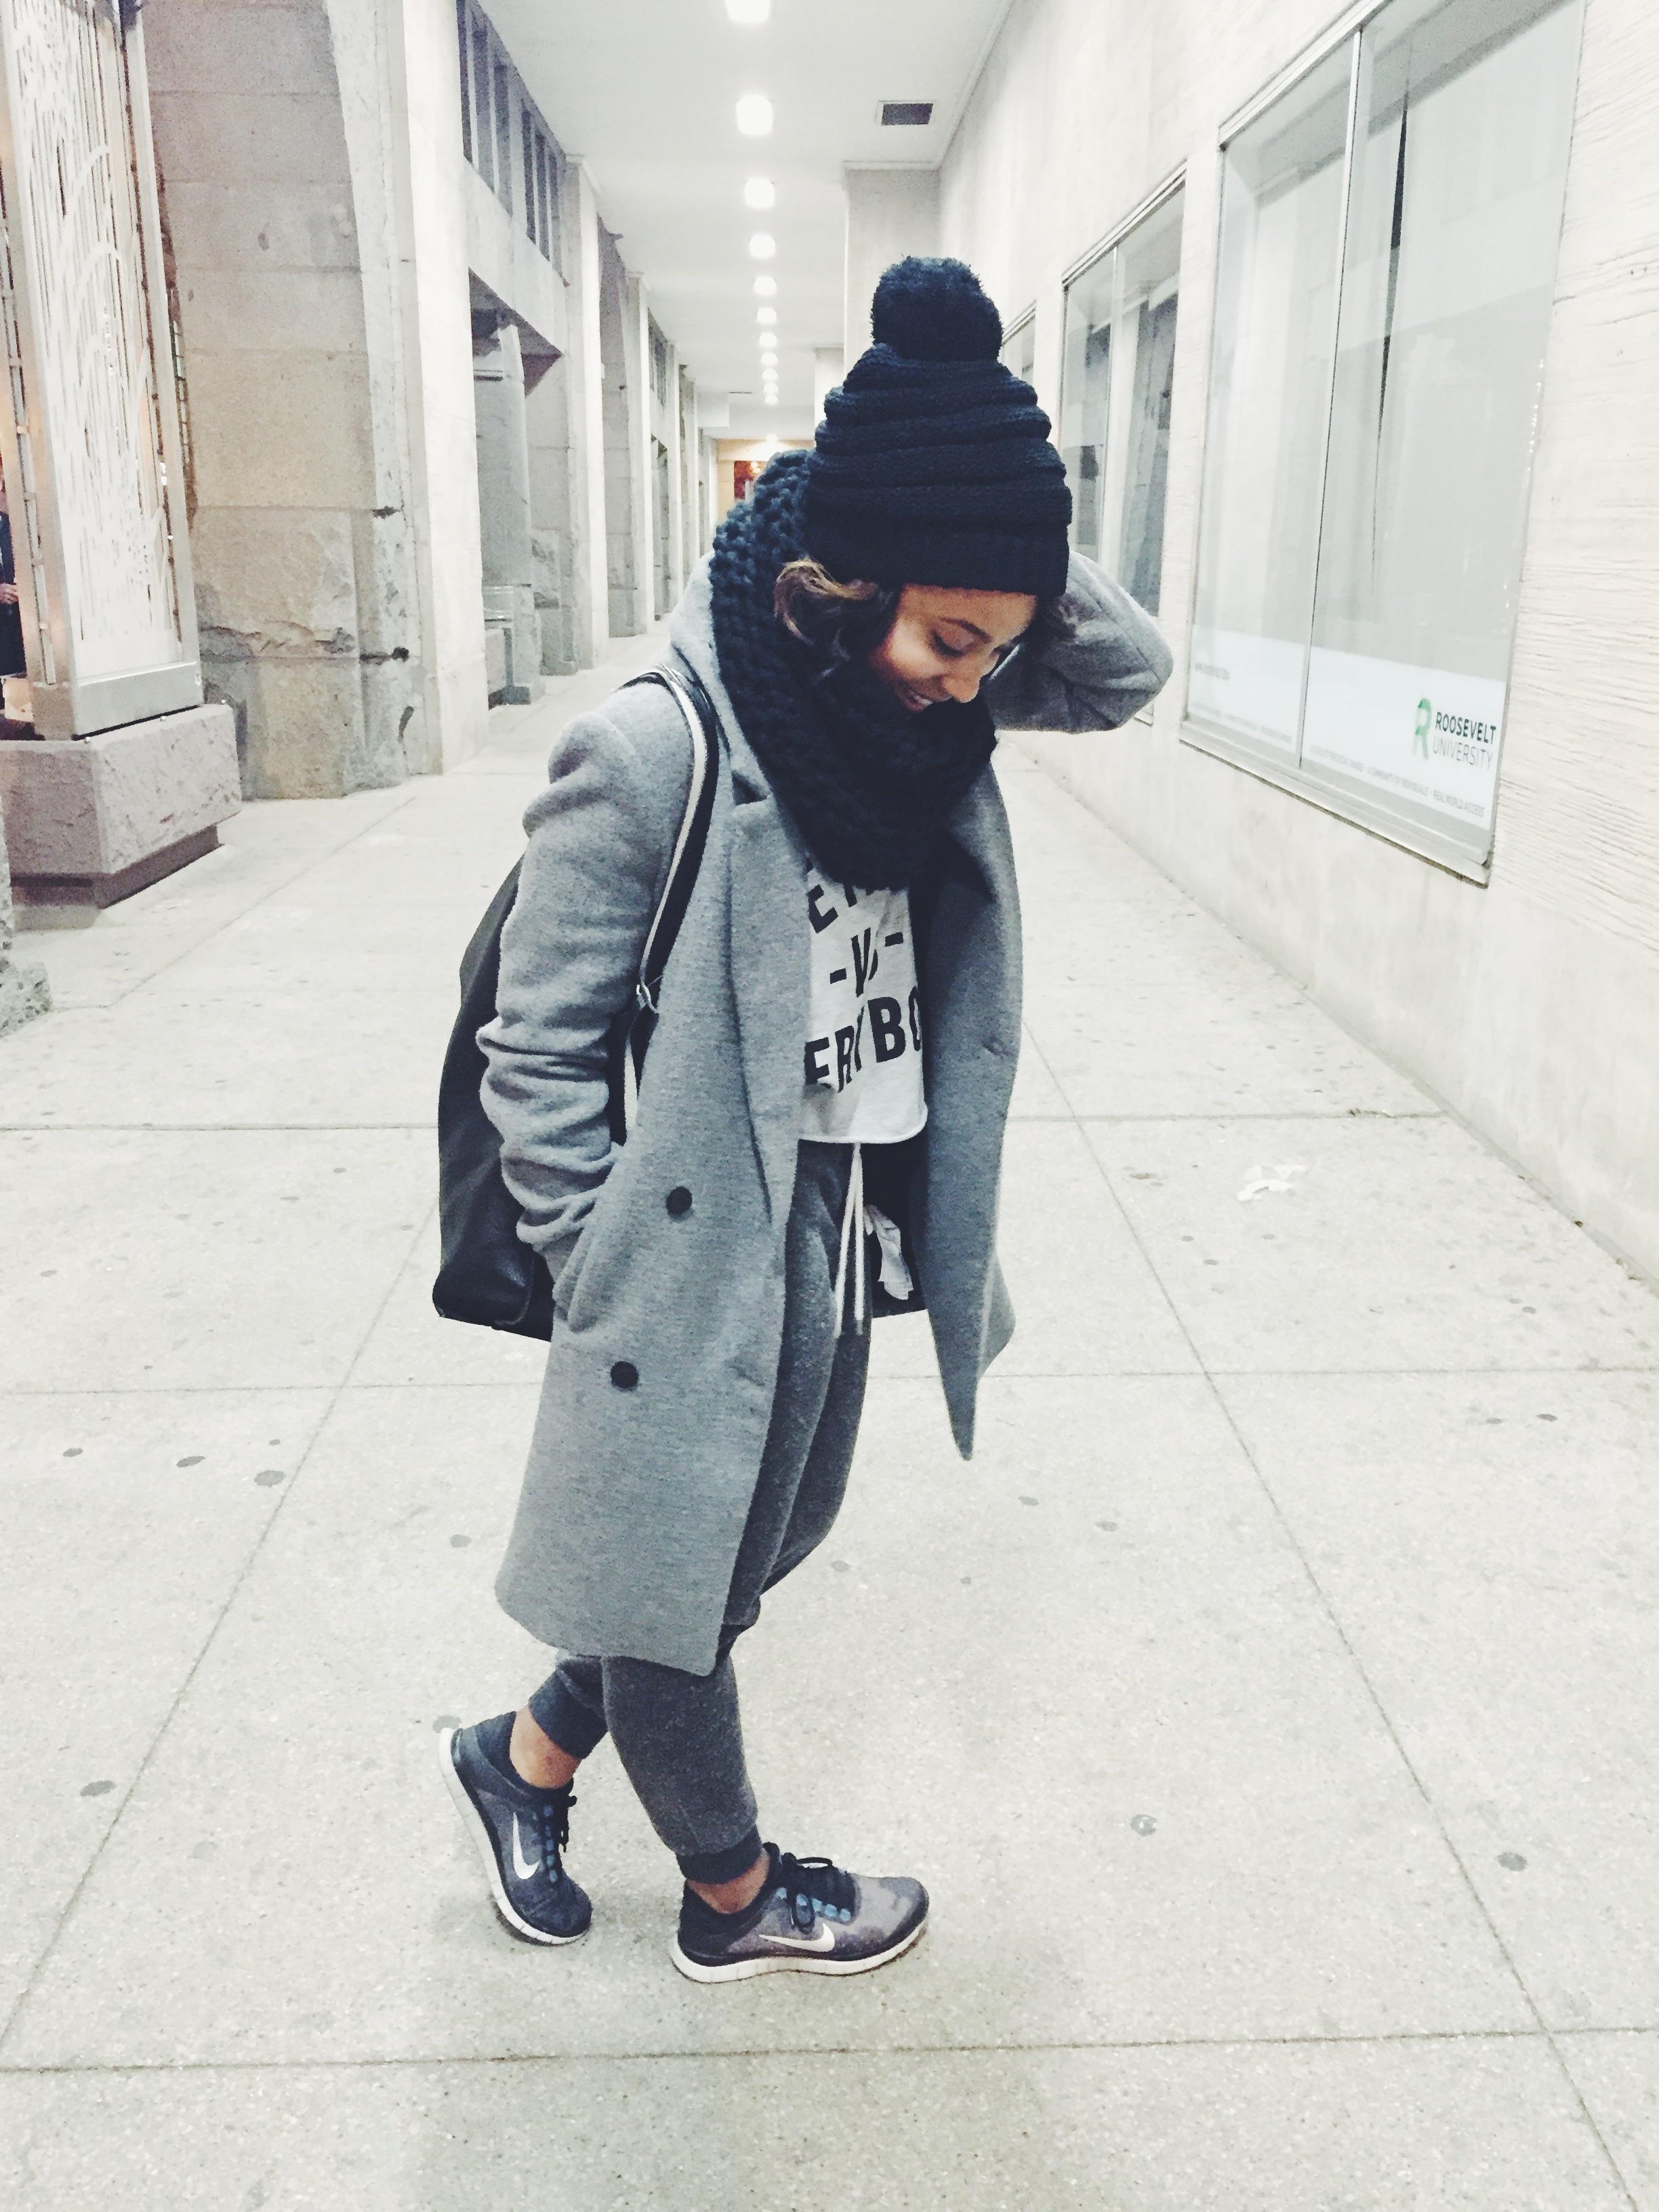 Hat: Akira/ Coat: Zara/ Shirt: Detroit vs. Everybody/ Pants: Topshop/ Shoes: Nike/ Bag: Francesca's/ Scarf: Zara